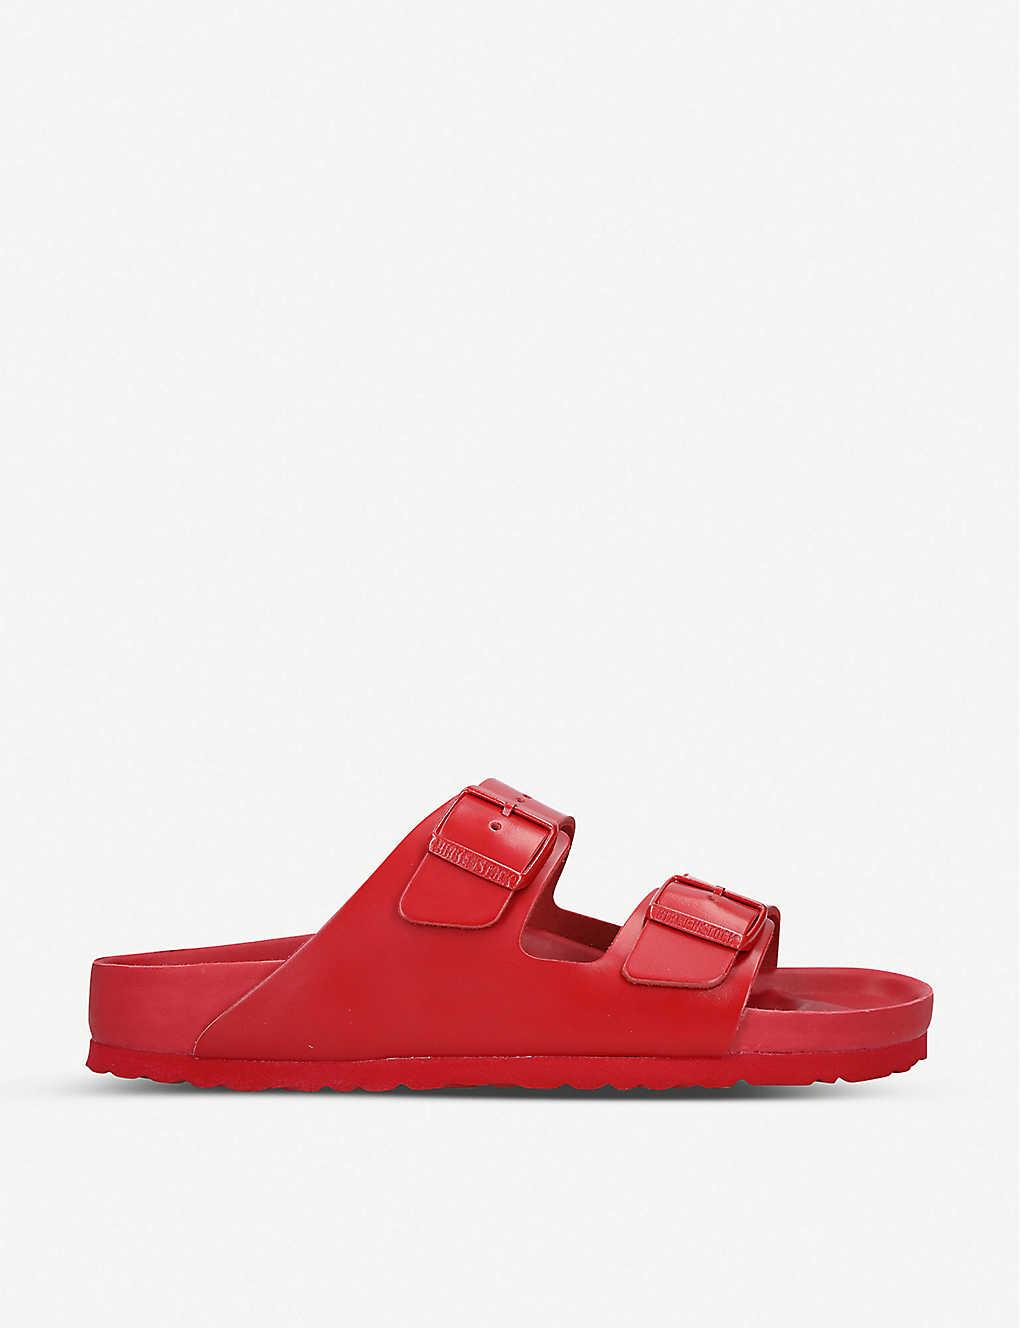 Valentino Slippers Valentino x Birkenstock leather sliders